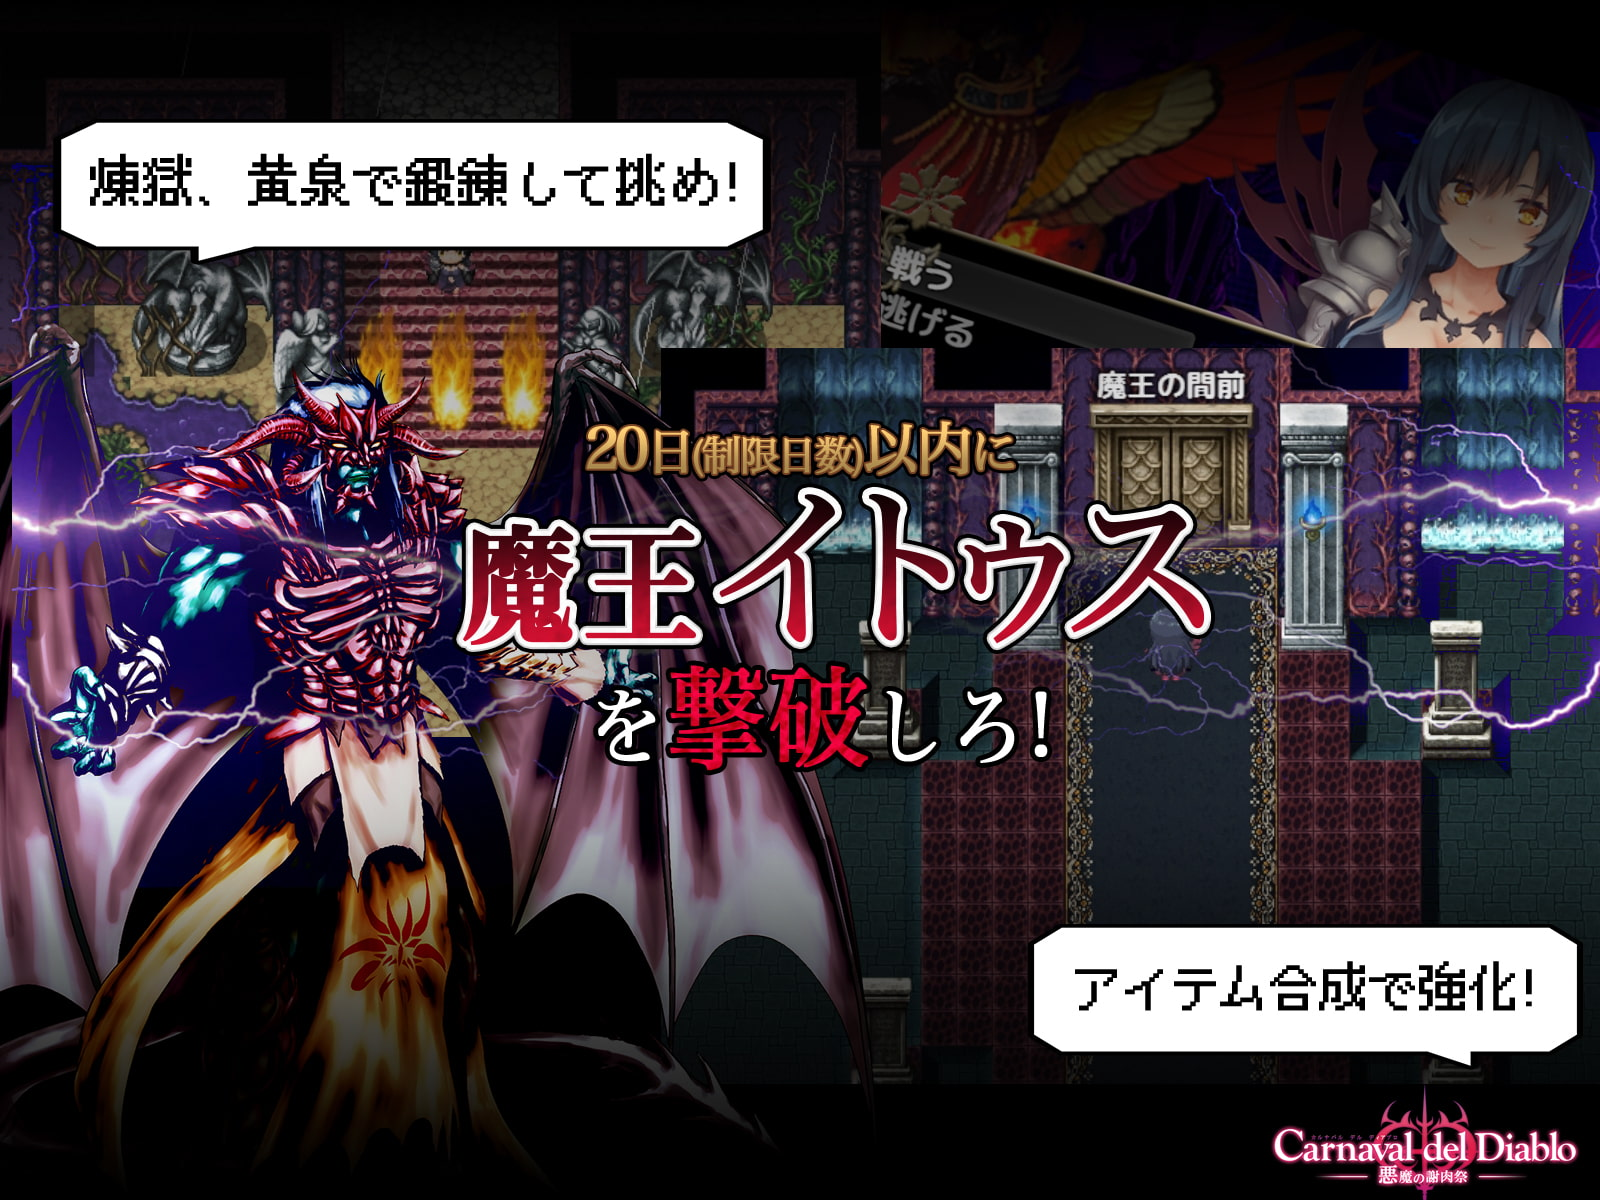 【20%OFF】Carnaval del Diablo ~悪魔の謝肉祭~